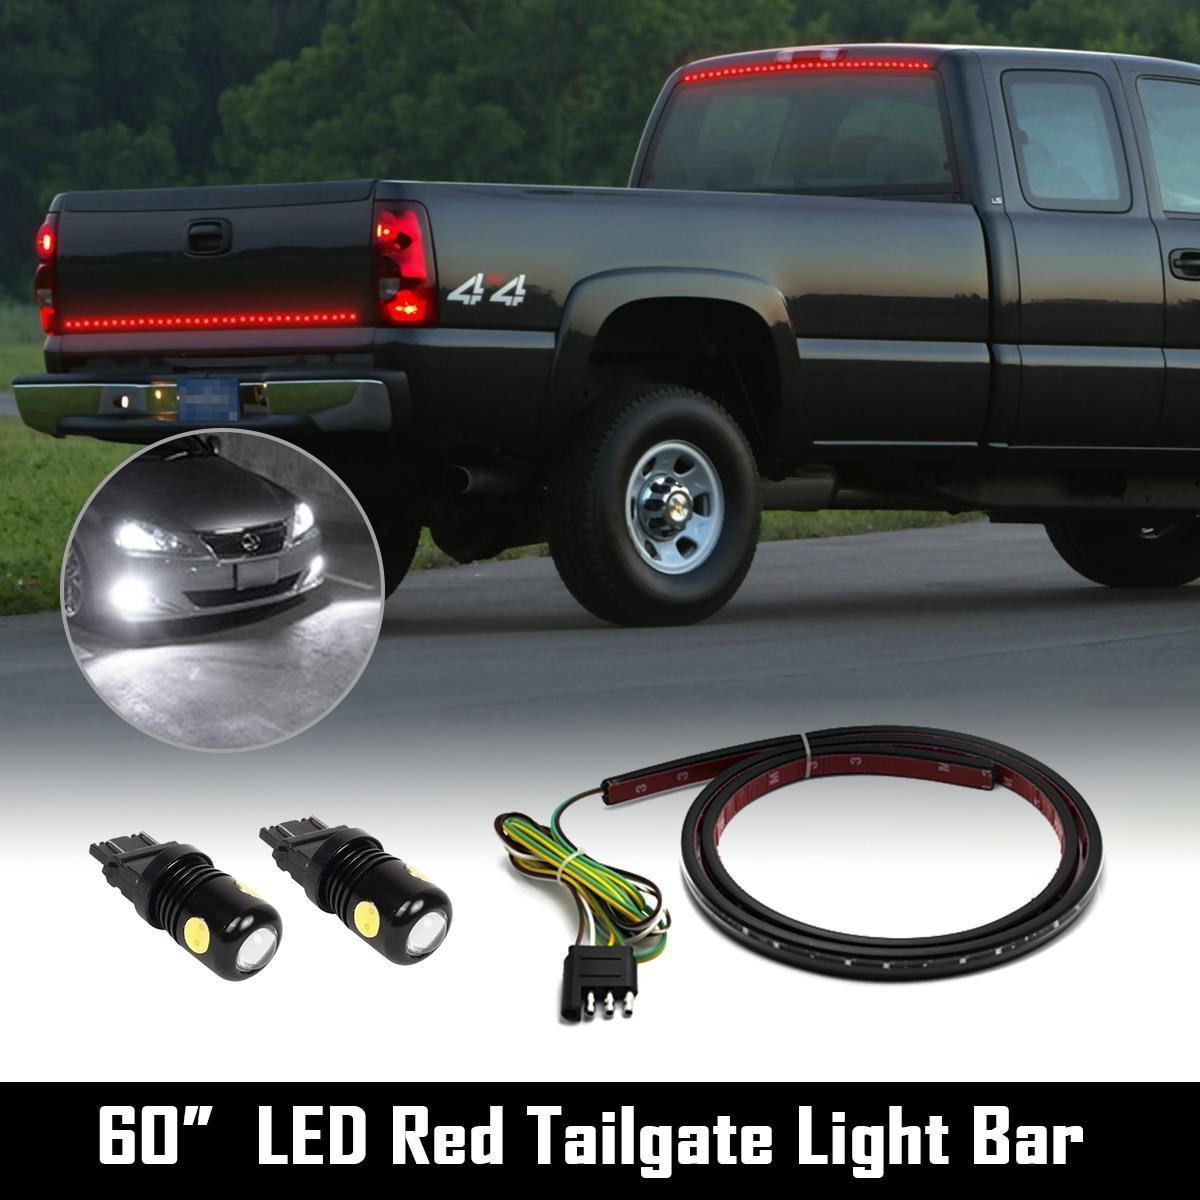 "Partsam Truck Tailgate Red Light Strip Bar Turn 60""+2x3157 Epistar-COB White LED Reverse"